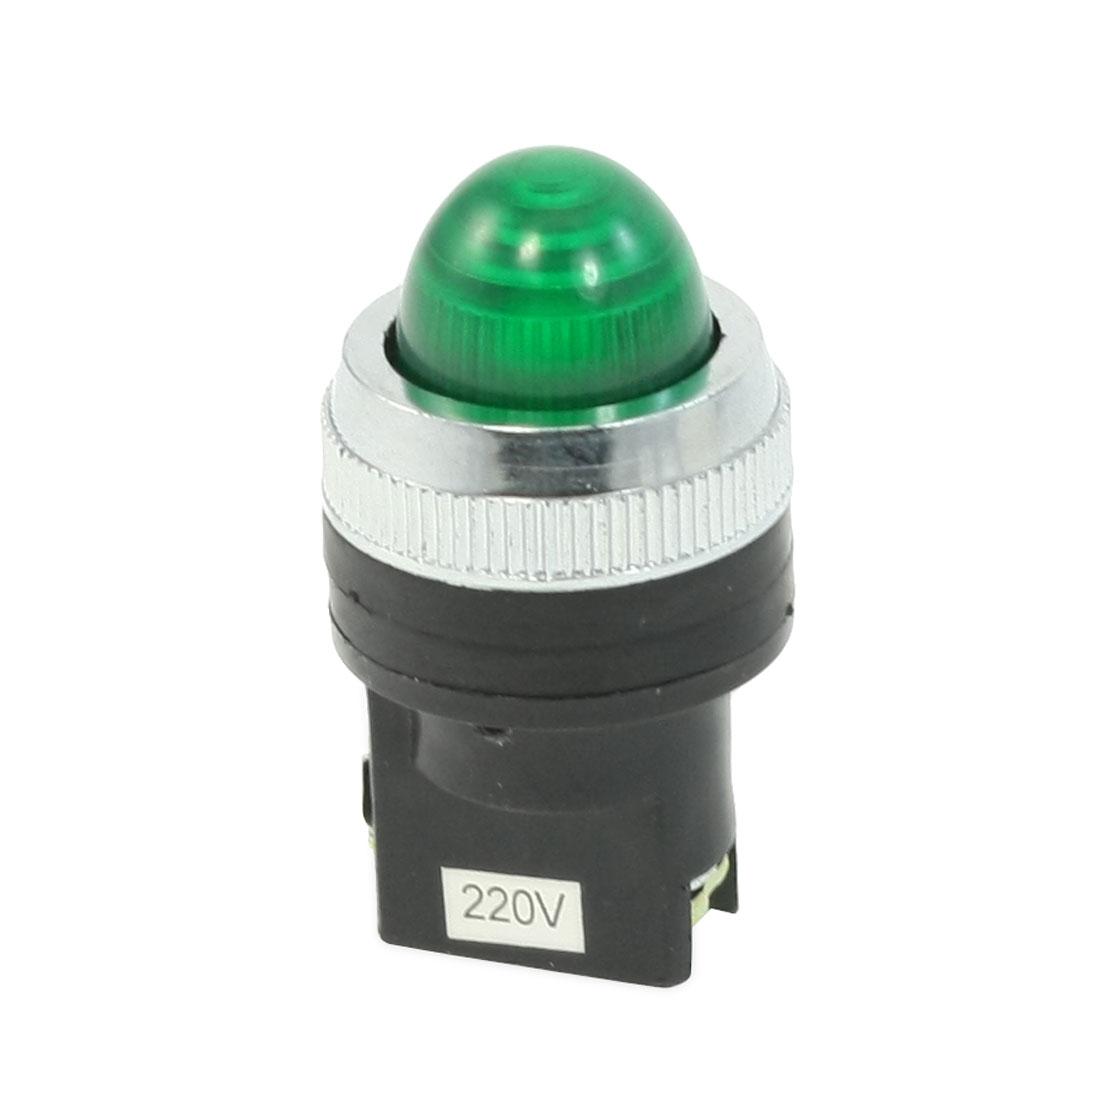 AC 220V Green Power Indicator Pilot Signal Light Lamp